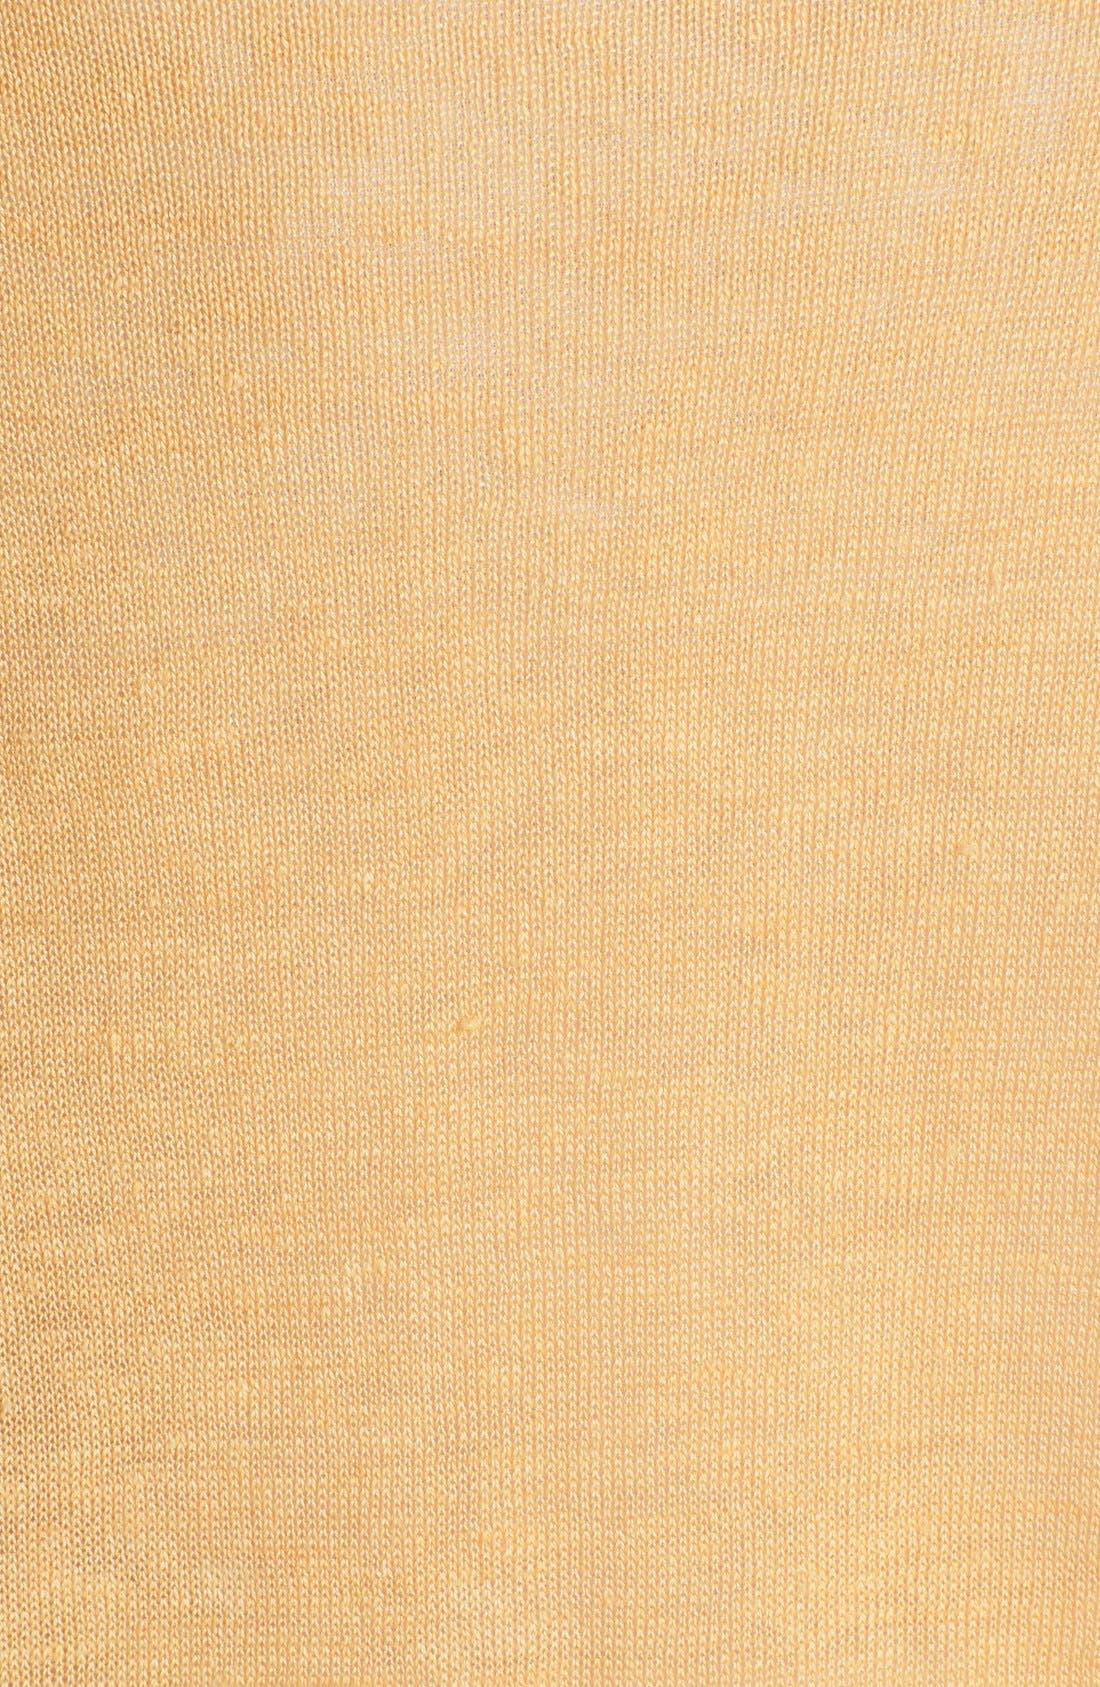 Alternate Image 3  - Eileen Fisher Ballet Neck Organic Linen Top (Regular & Petite)